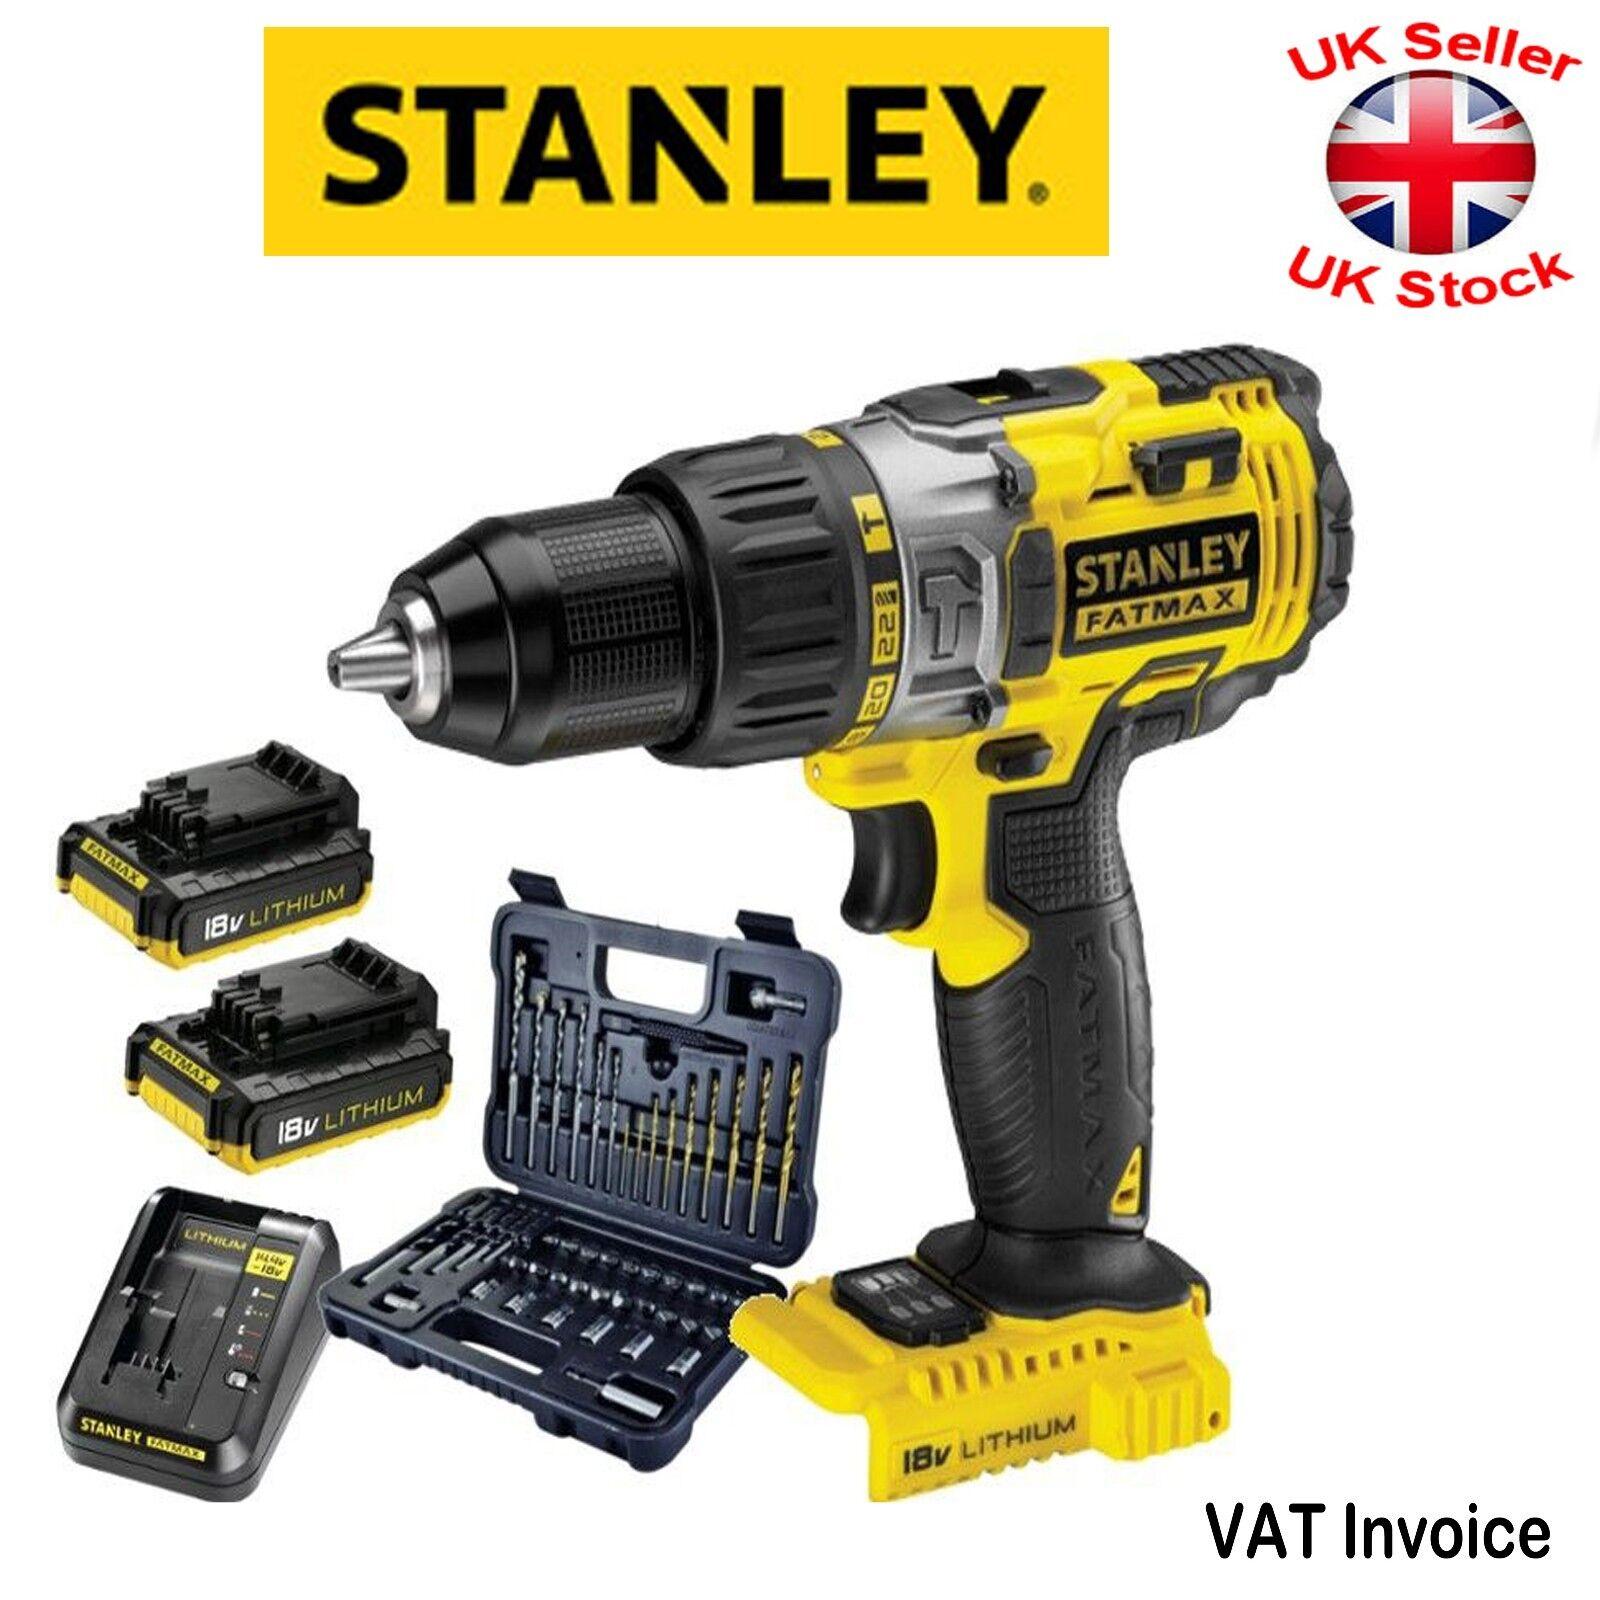 Stanley FatMax FMC625ARW1 Cordless Hammer Drill 2x Battery 18V + 50 pcs Bits Set